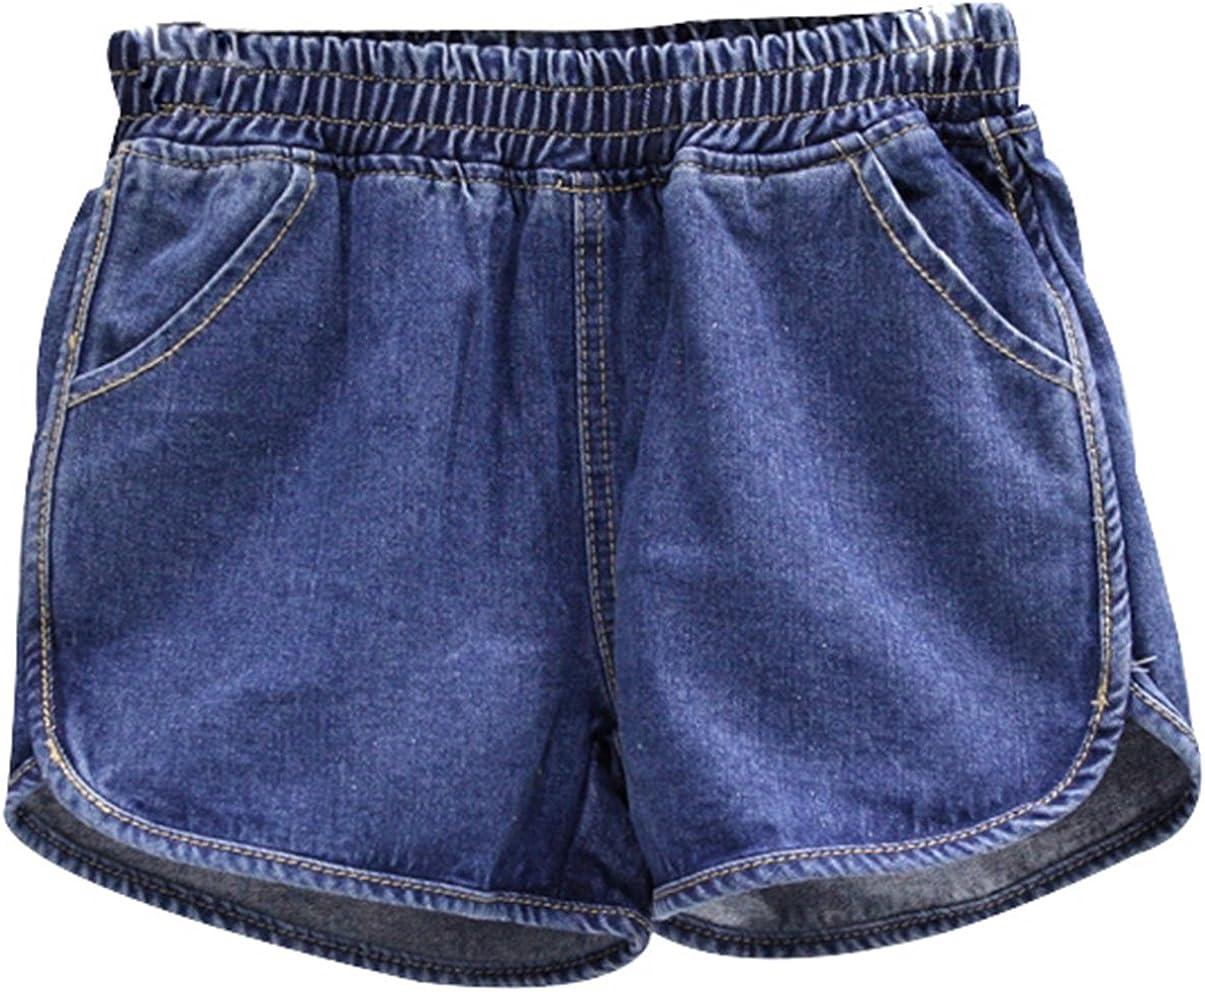 Casual Shorts Trendy XU Girls High Elastic Waist Vintage Jeans Denim Short